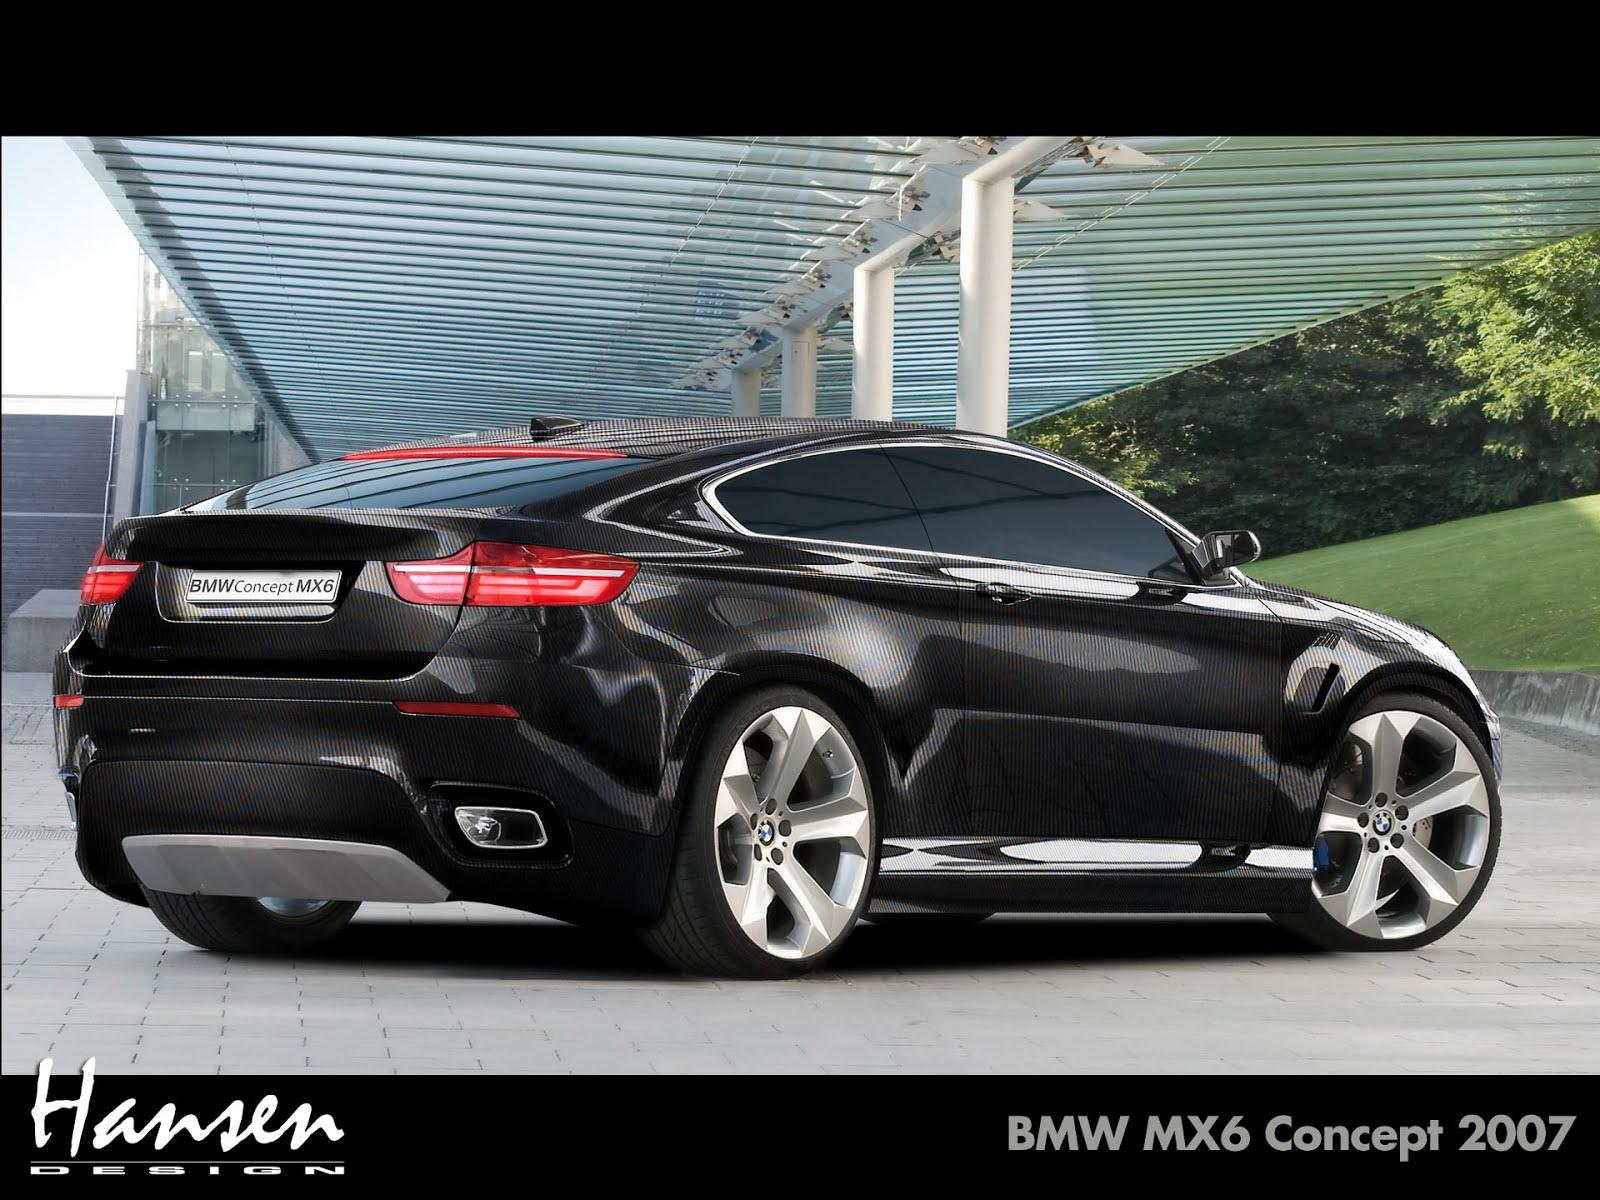 BMW Cool Car Wallpapers For Desktop Cool Car Wallpapers For Desktop - Bmw cool car